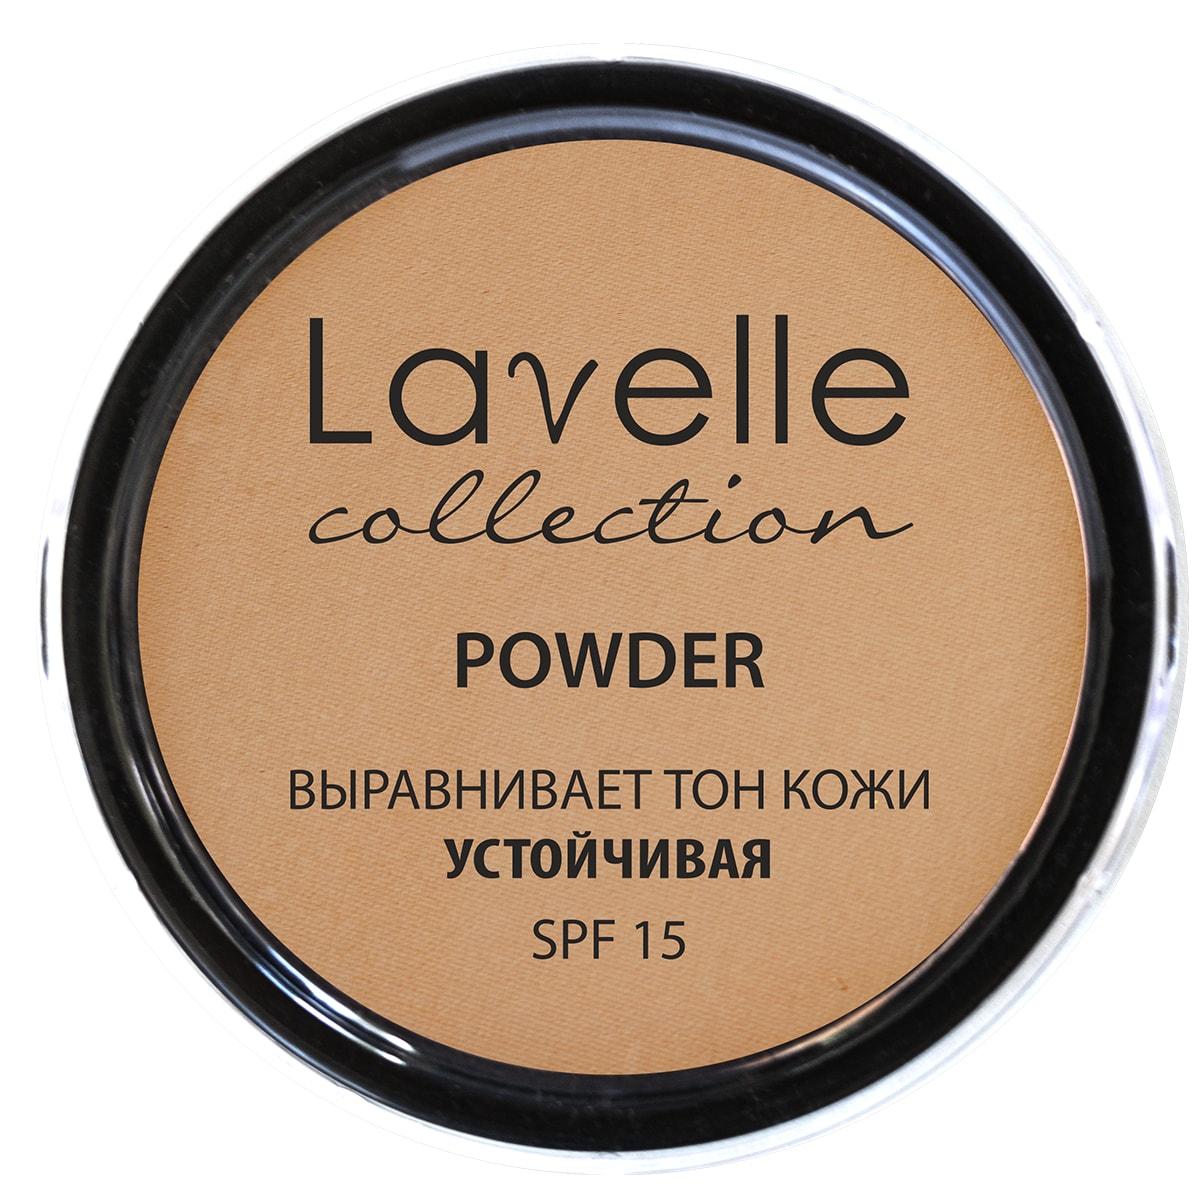 Фото - Lavelle Collection пудра для лица PD-12 компактная устойчивая тон 04 натурально-бежевый 40г lavelle collection пудра для лица pd 11 компактная тон 05 кремовый 40г